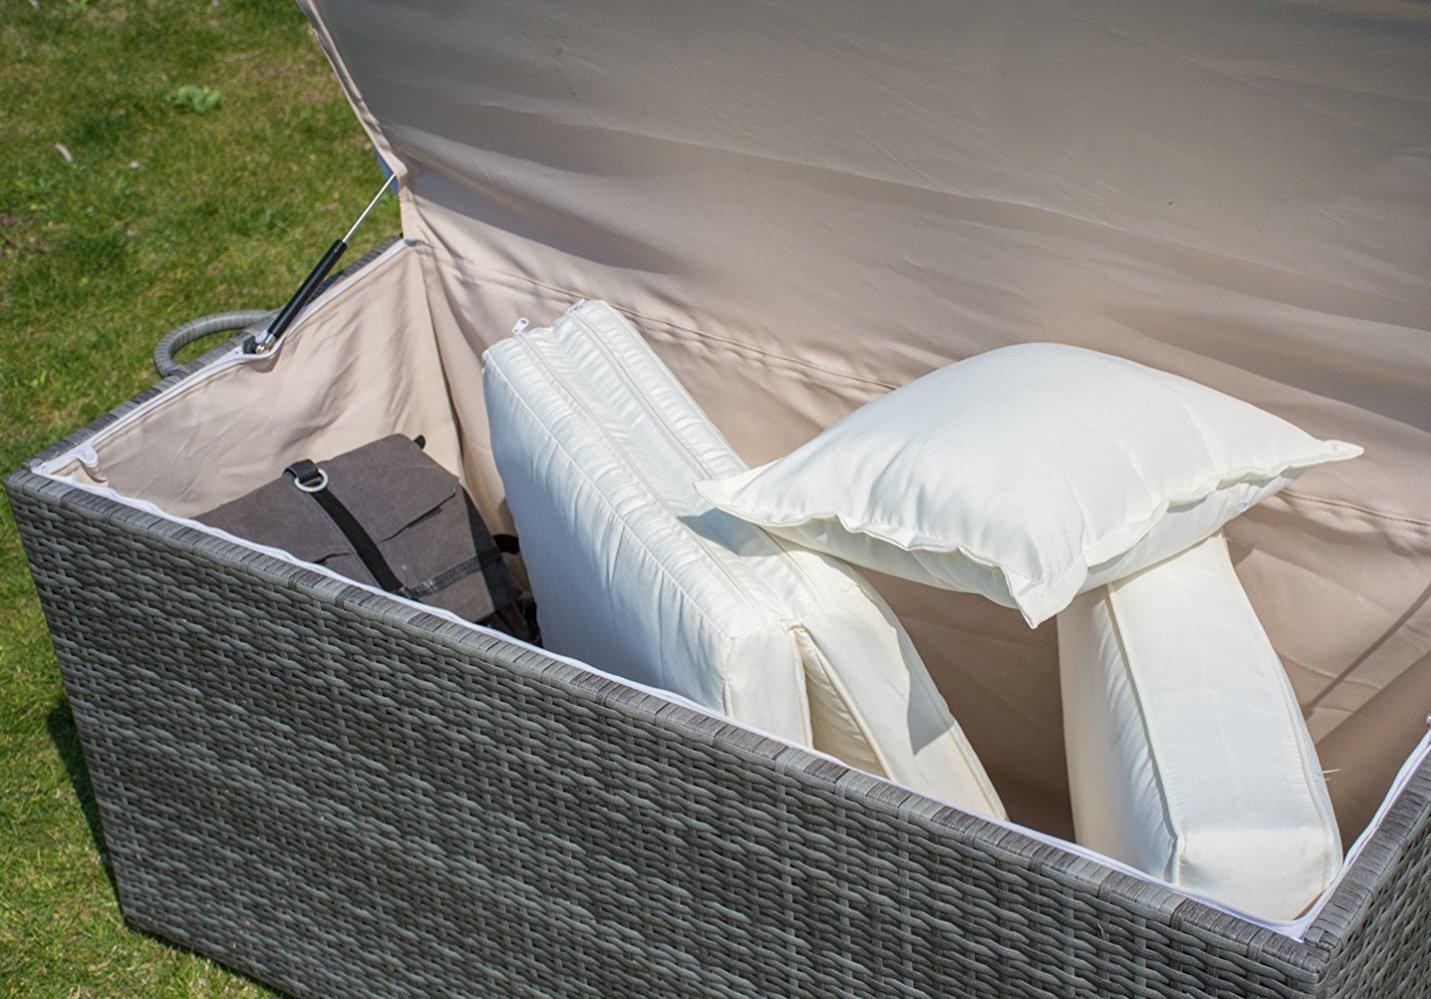 Storage Bin Deck Box PE Wicker Outdoor Patio Cushion Container Garden Furniture, Grey by PatioPost (Image #7)